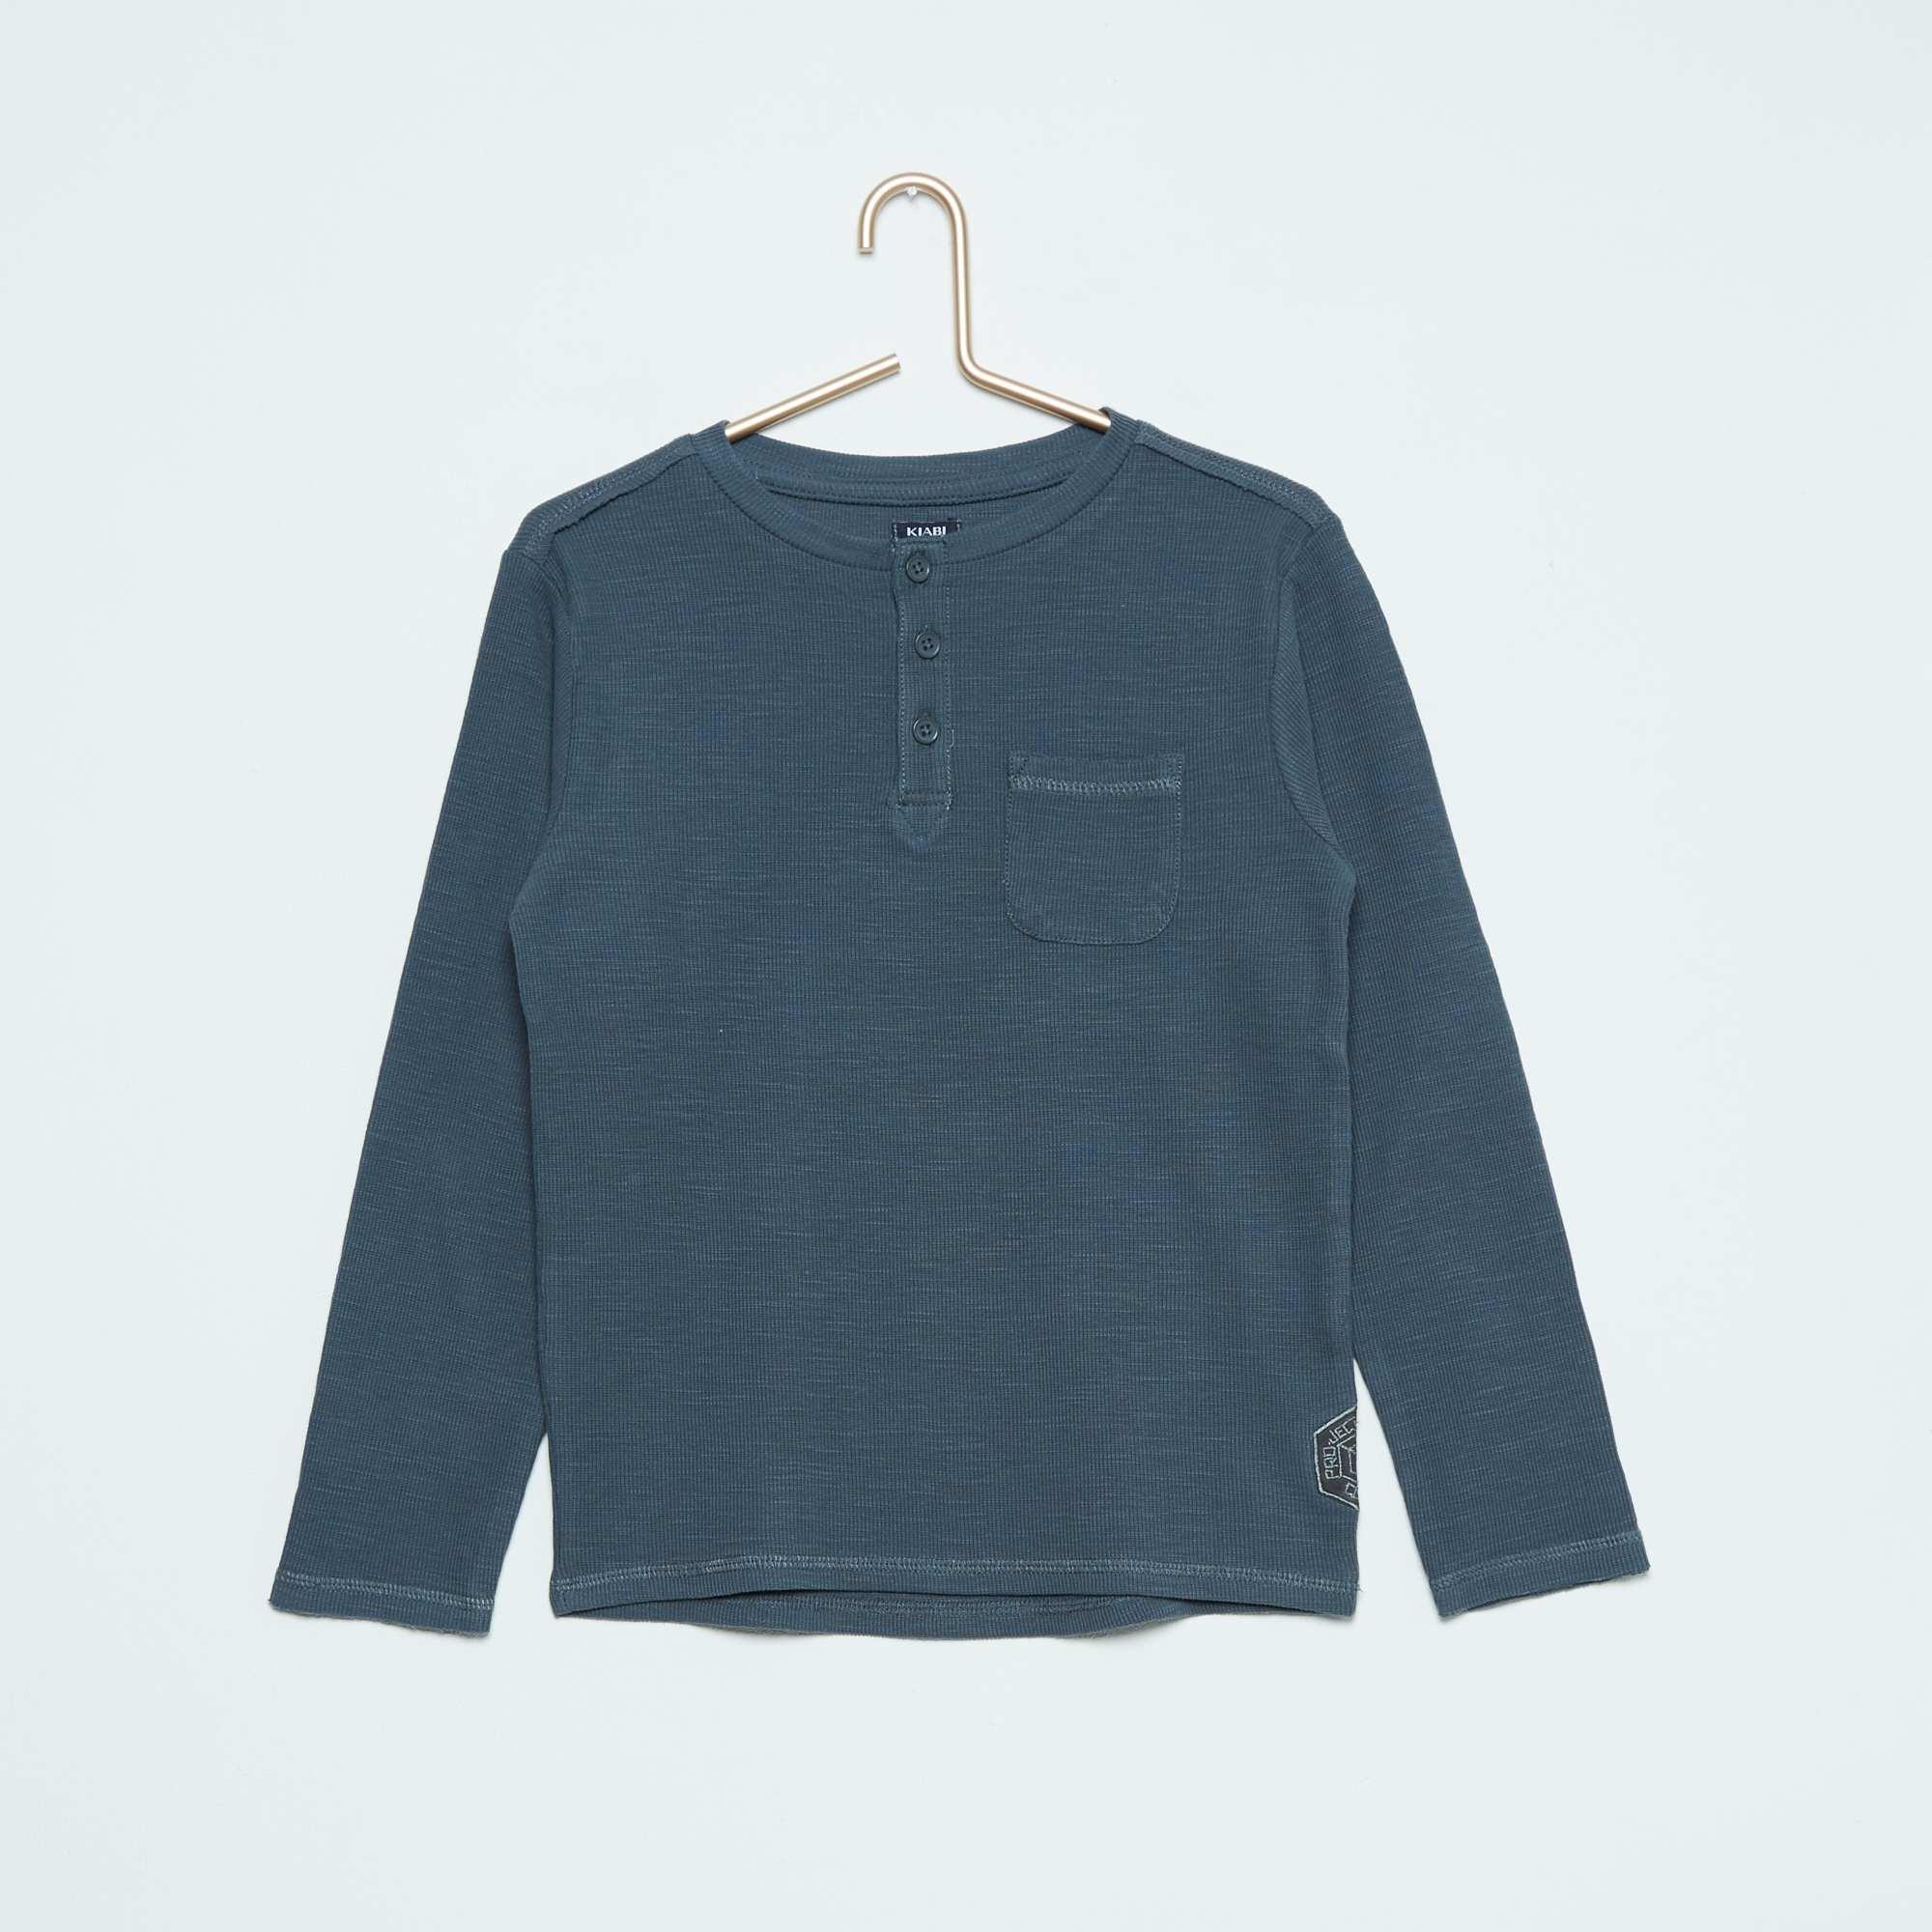 tee shirt col tunisien gar on gris kiabi 7 00. Black Bedroom Furniture Sets. Home Design Ideas